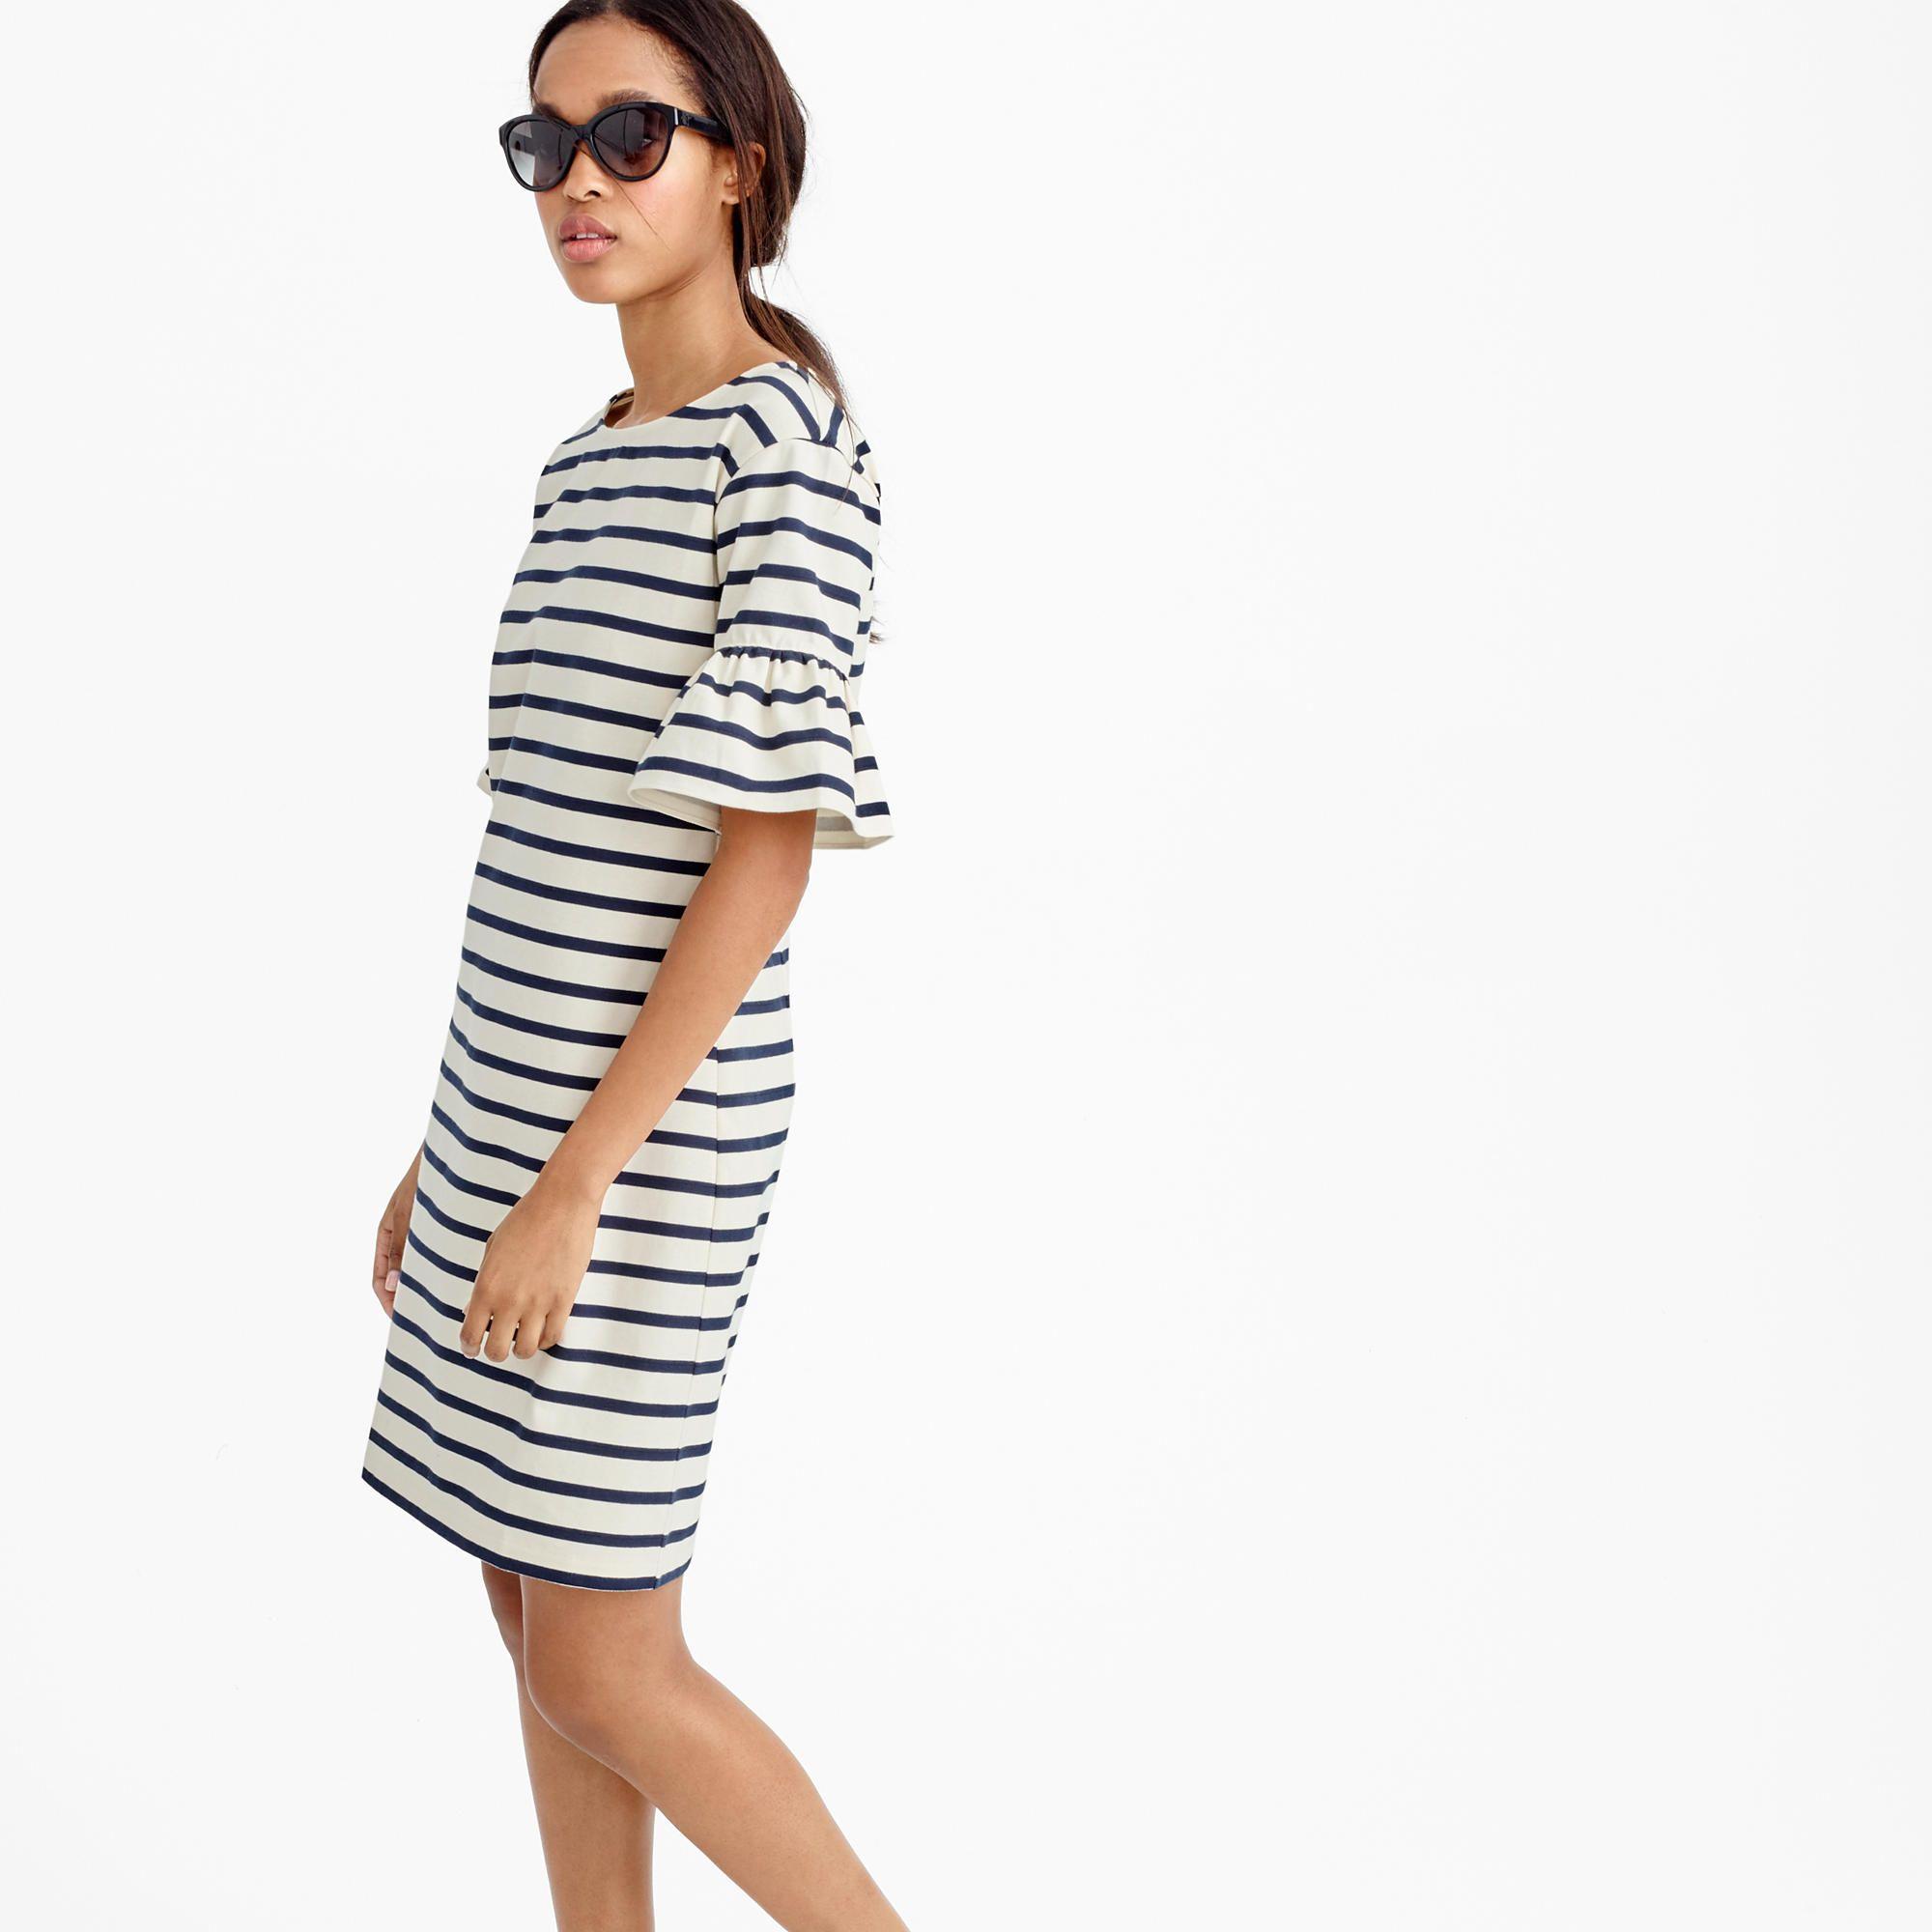 Ruffled bell-sleeve shift dress in stripe : day | J.Crew | Fashion ...